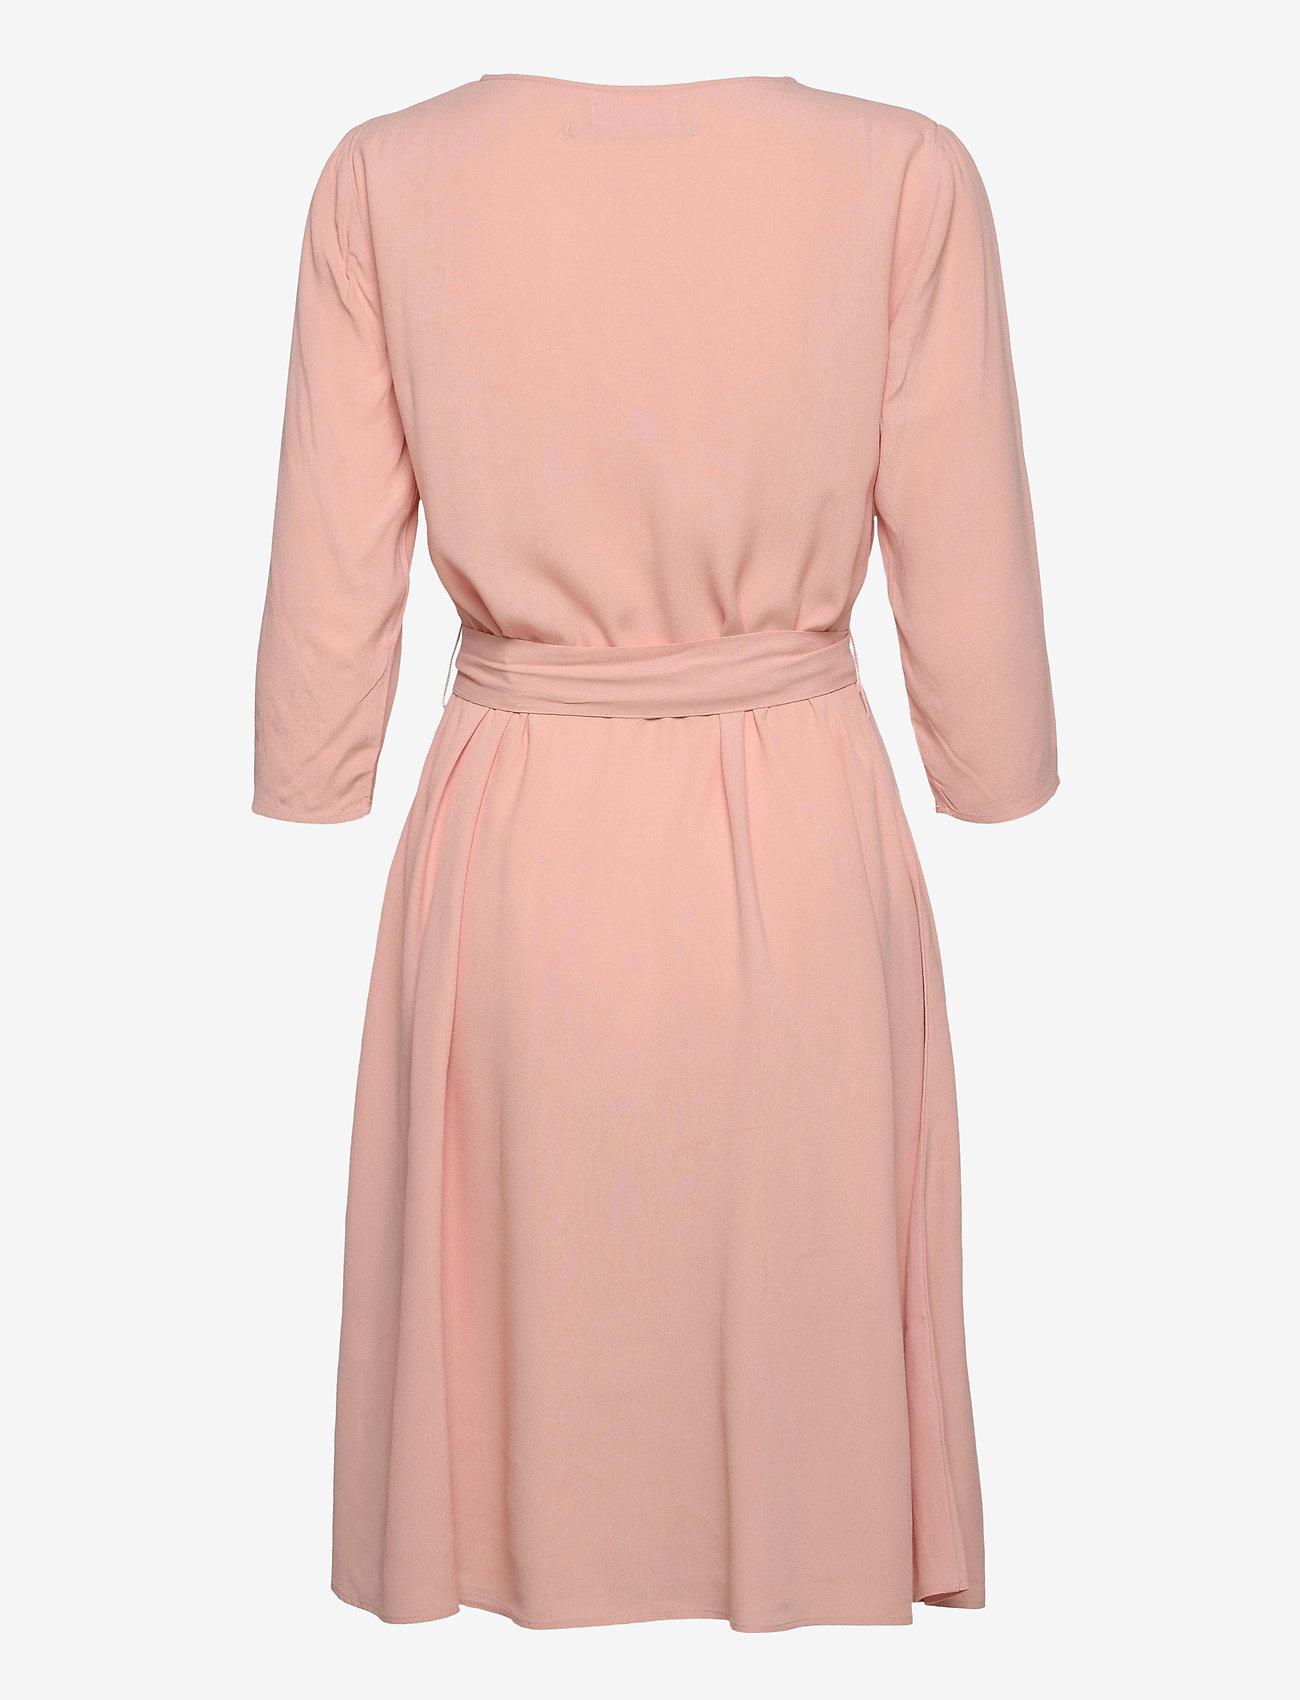 2NDDAY - 2ND June ThinkTwice - everyday dresses - misty rose - 1